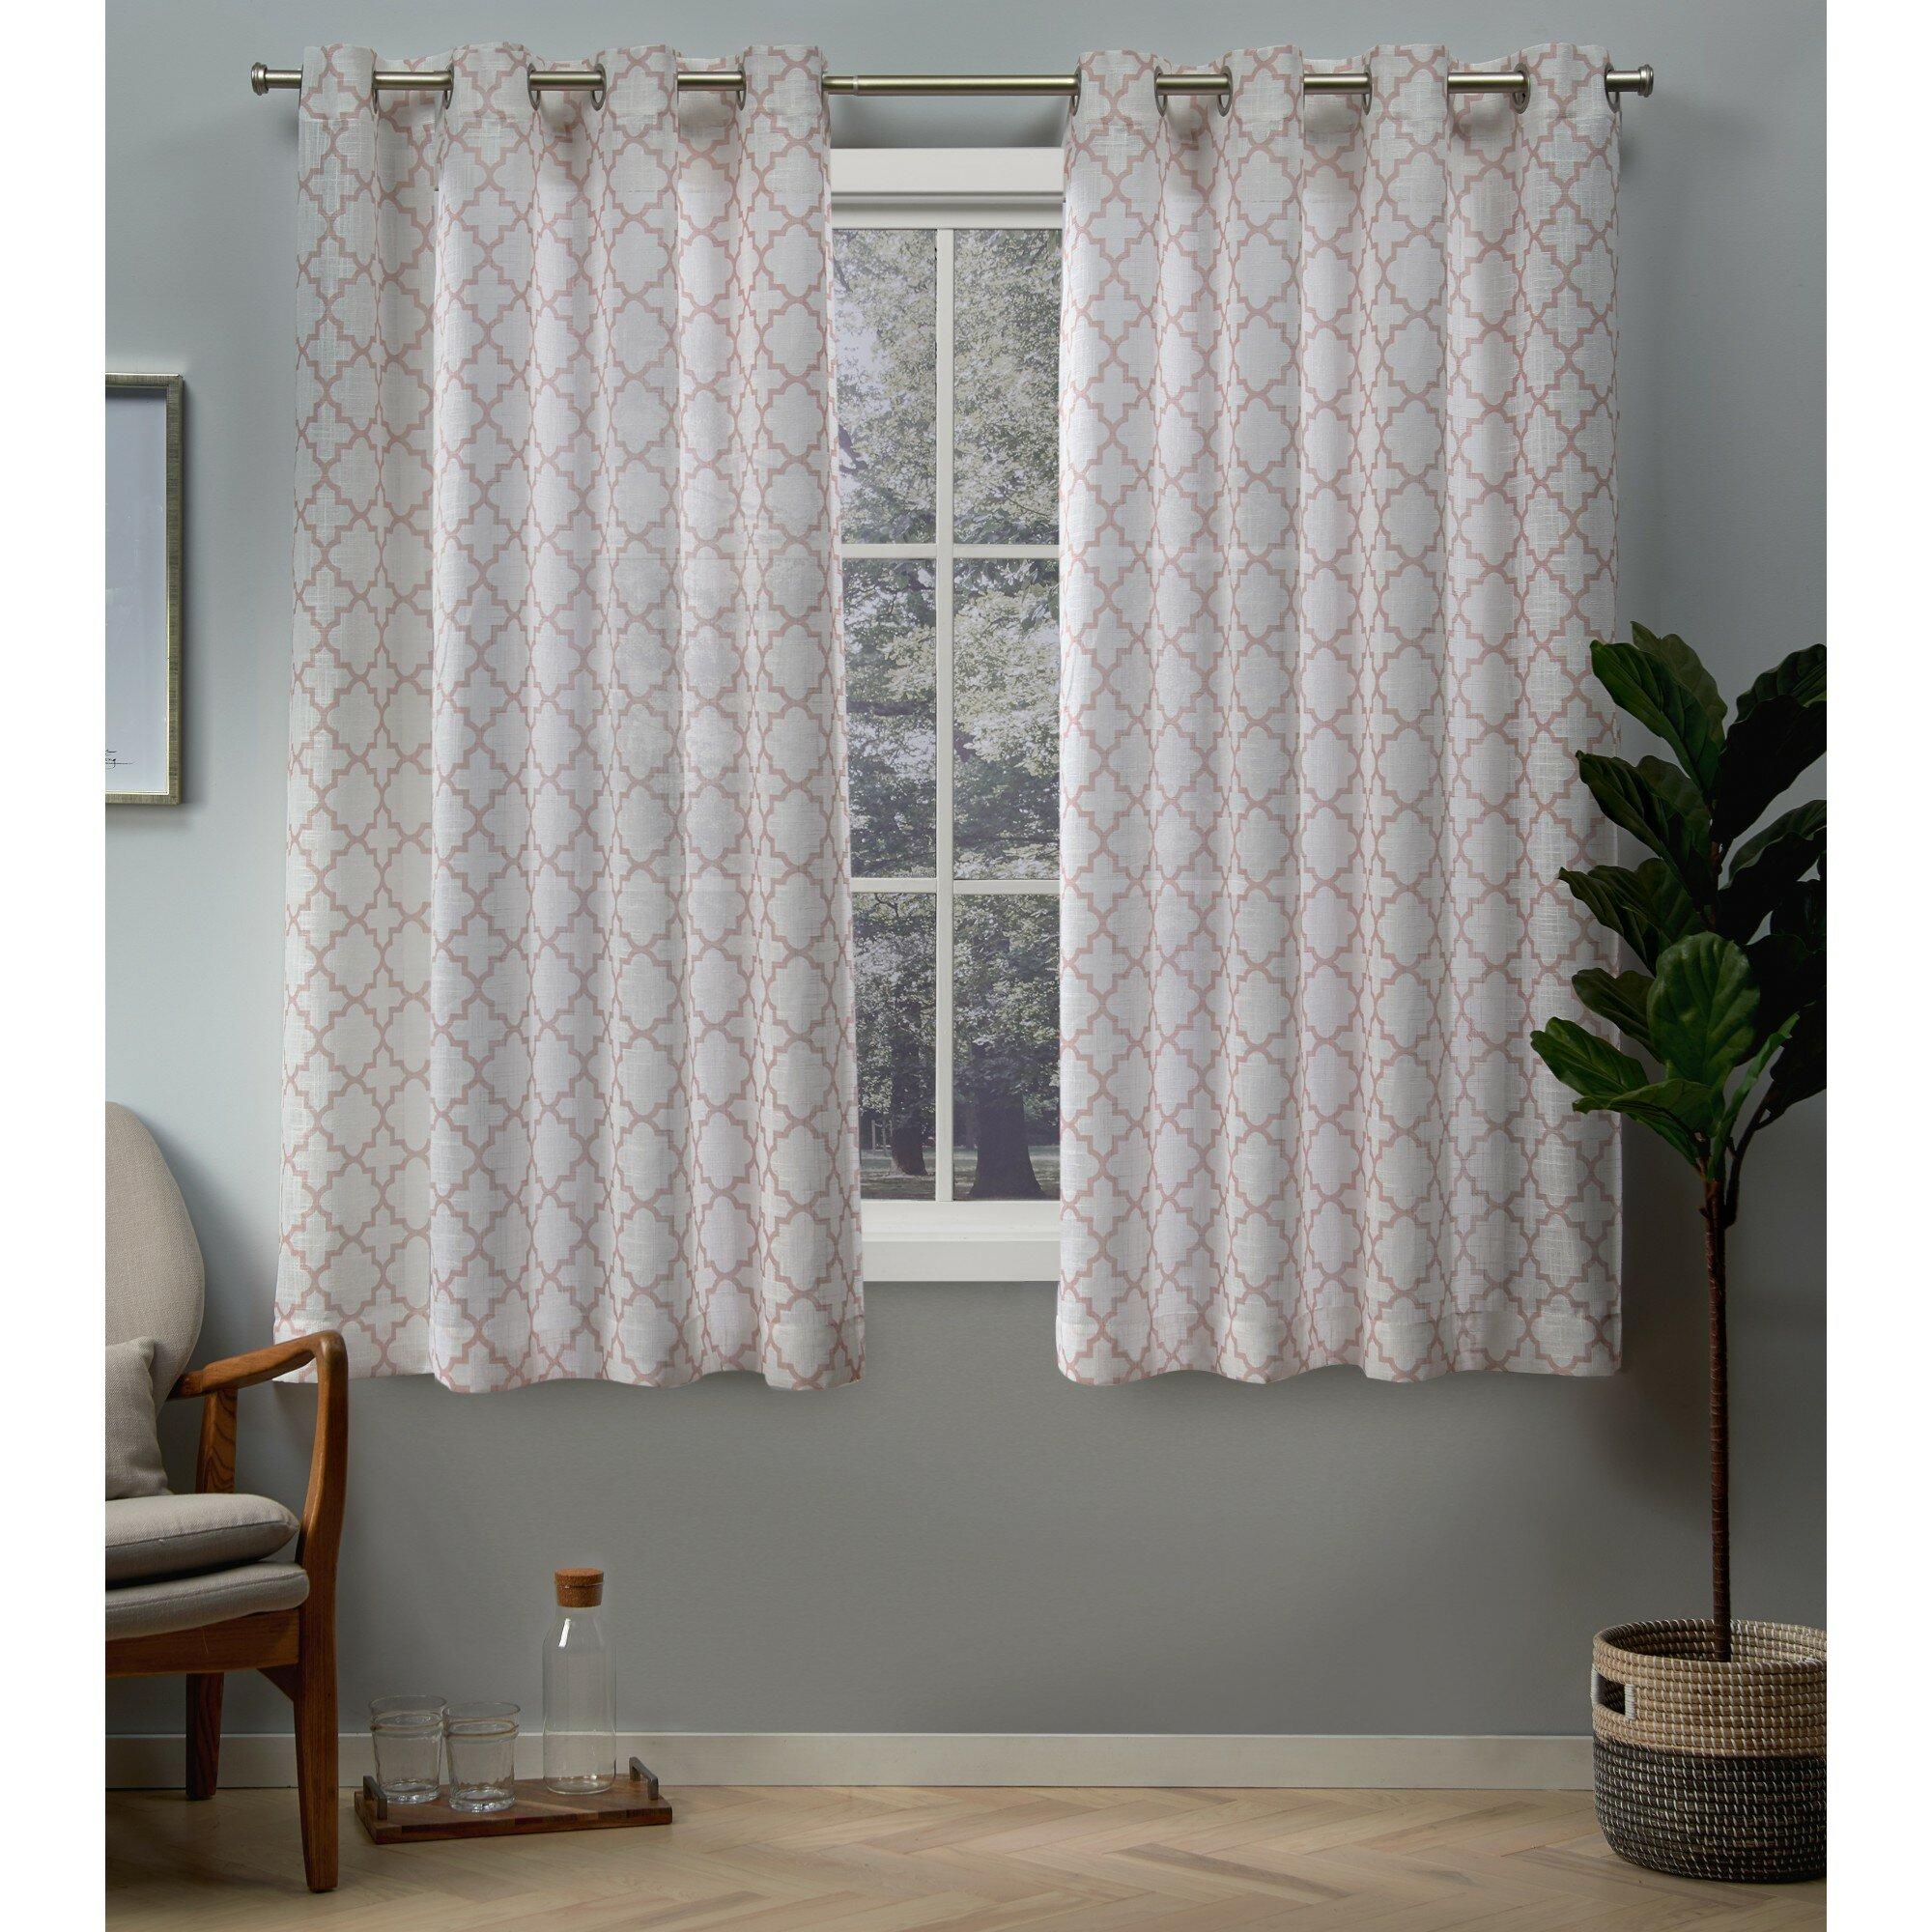 Barksdale Geometric Room Darkening Grommet Curtain Panels Regarding Geometric Linen Room Darkening Window Curtains (View 13 of 20)